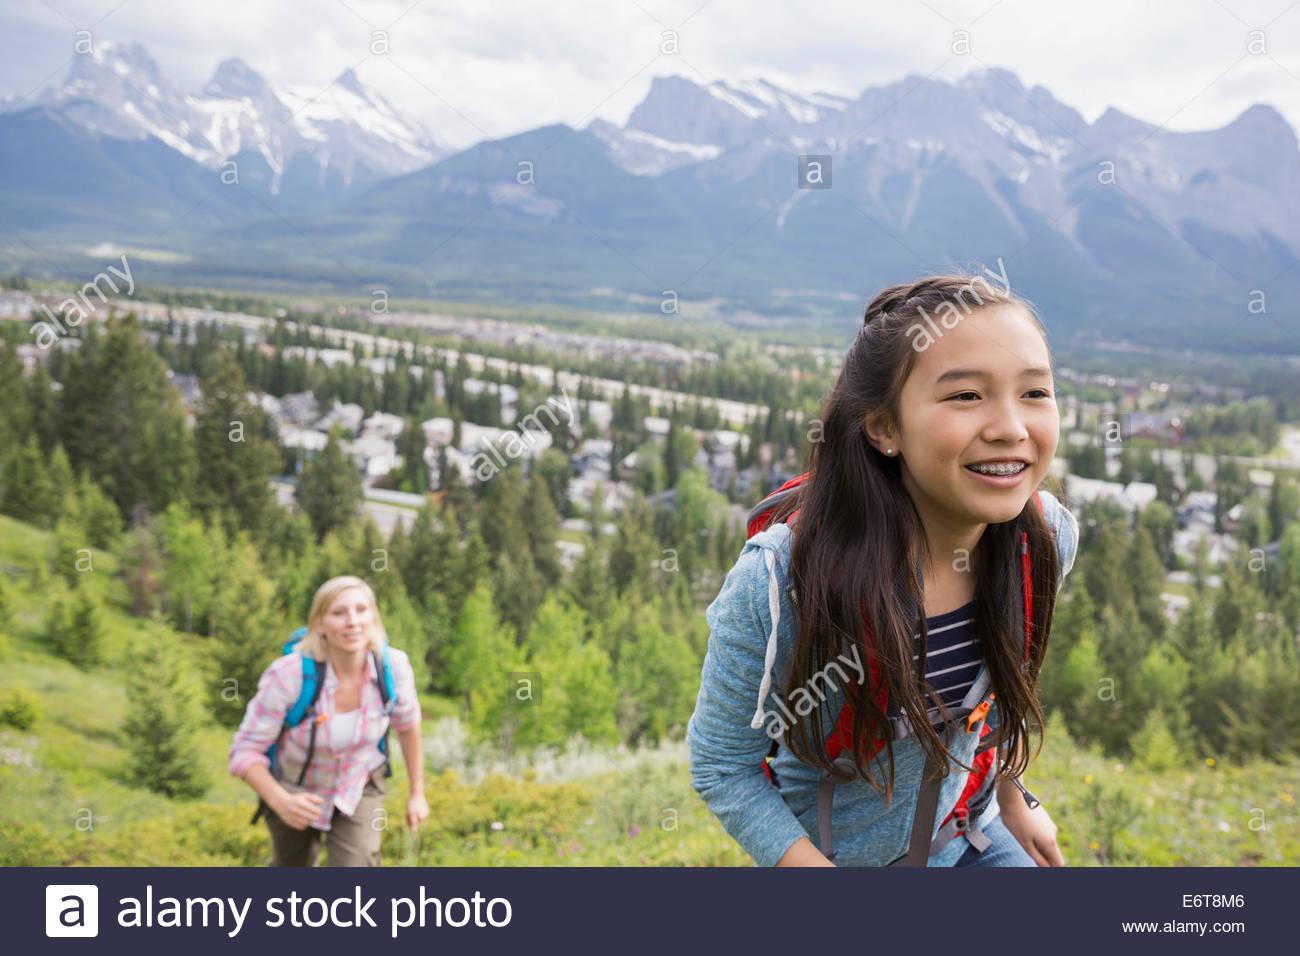 Mère et fille randonnées on rural hillside Photo Stock